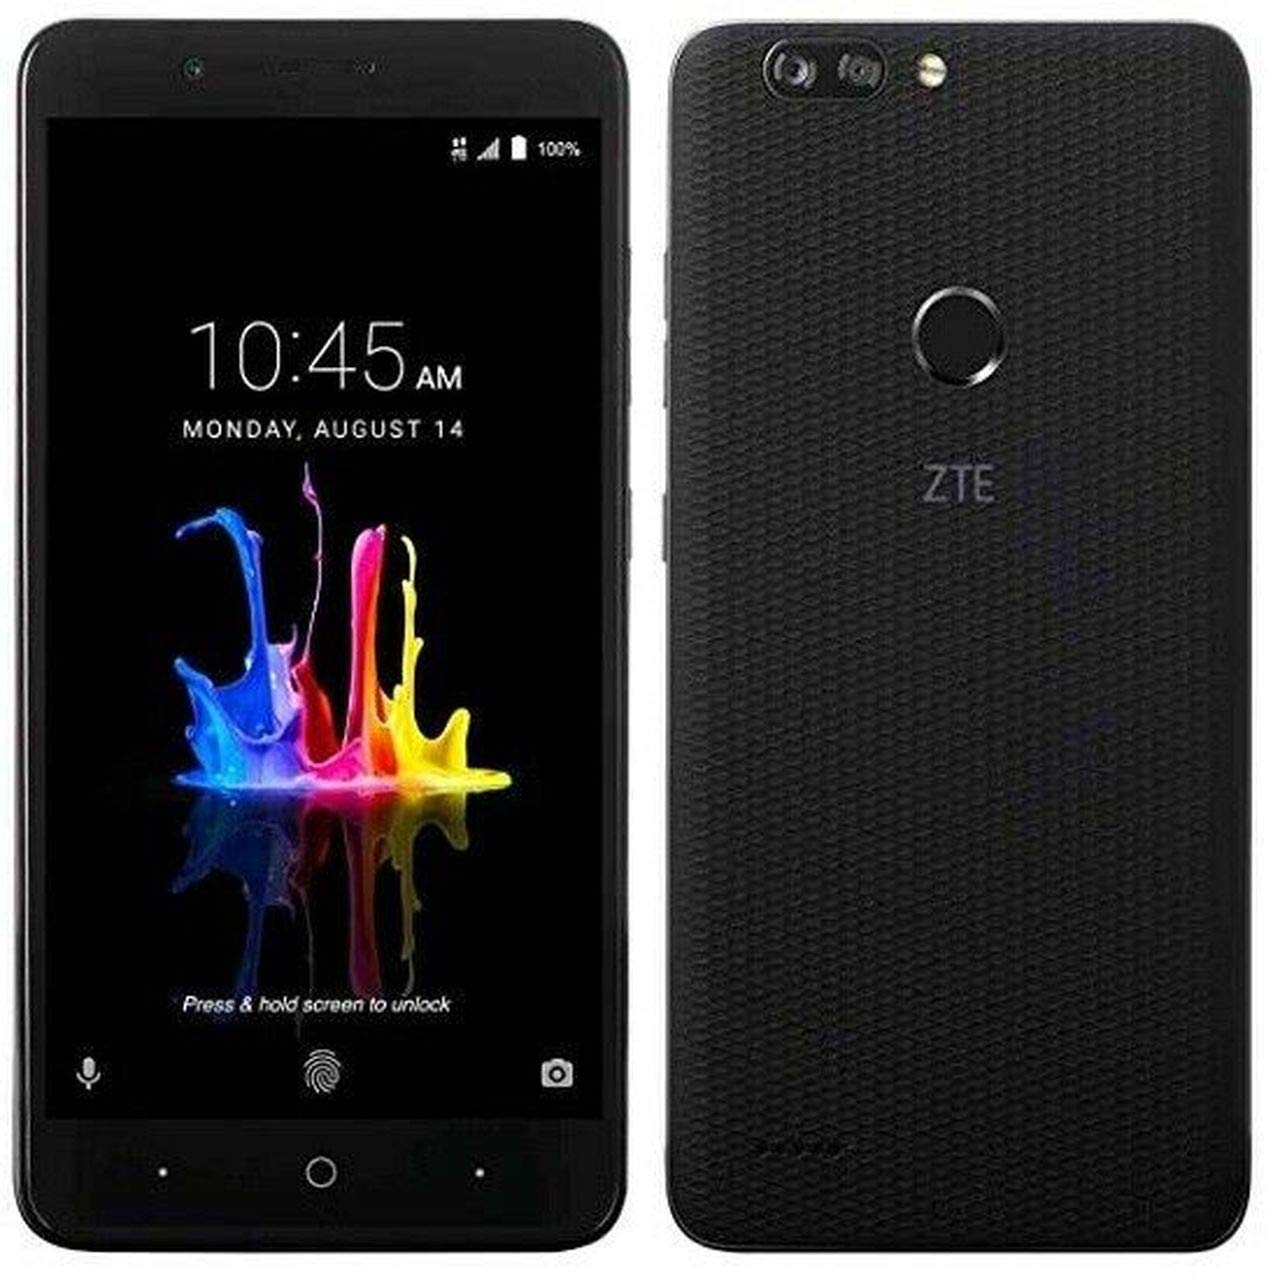 ZTE BLADE Z MAX Z982 (32GB, 2GB RAM) 6.0'' Full HD Display, Dual Rear Camera, 4080 mAh Battery, 4G LTE GSM Unlocked Smartphone w/ US Warranty (Black) by ZTE